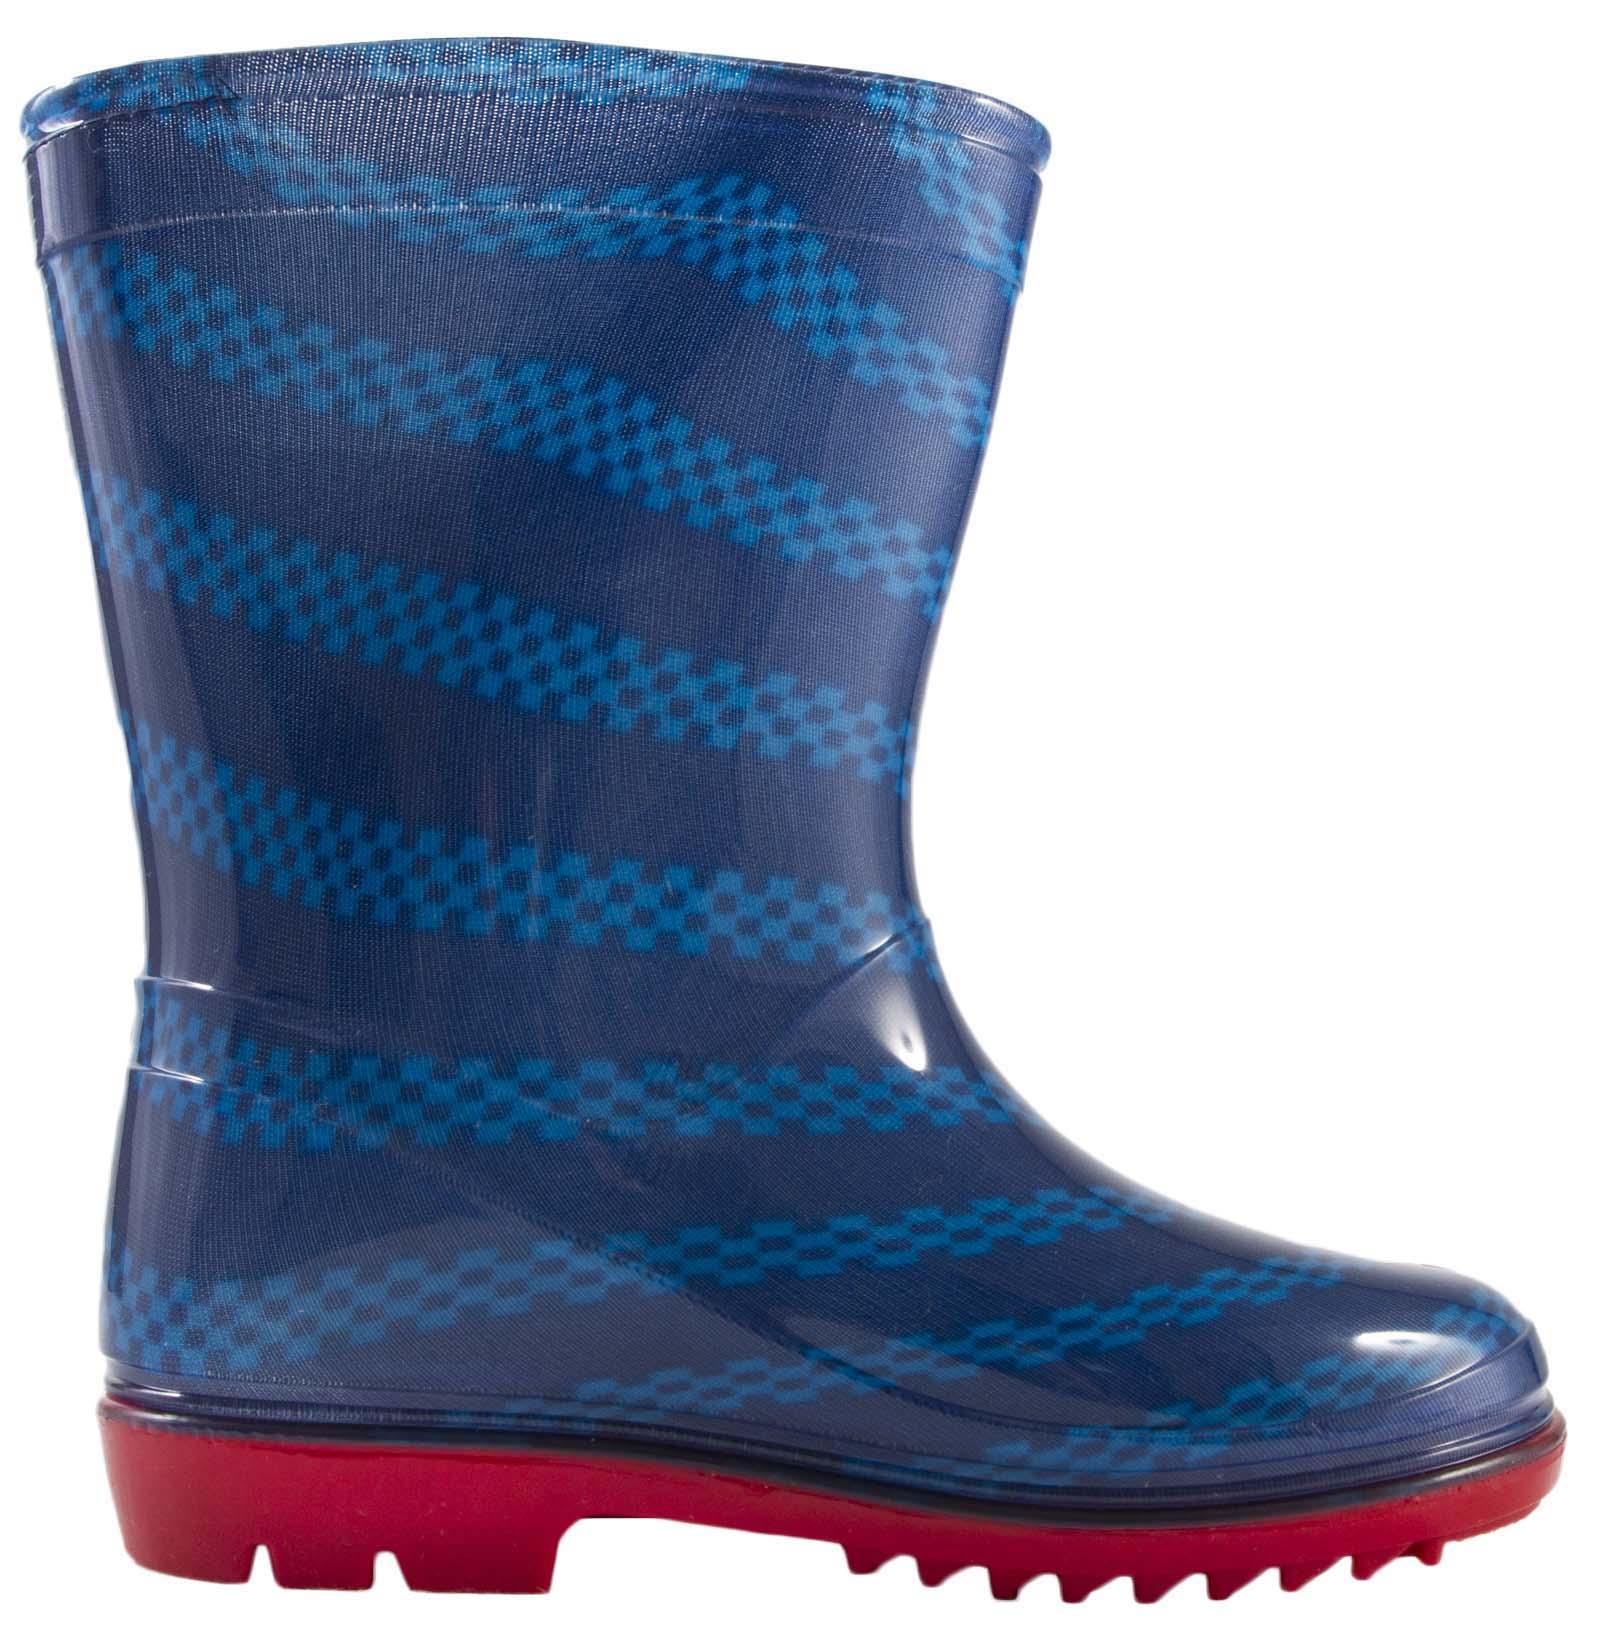 Kids Boys Disney Cars Lightning McQueen Wellies Rain Snow Winter Boots Size 5-12